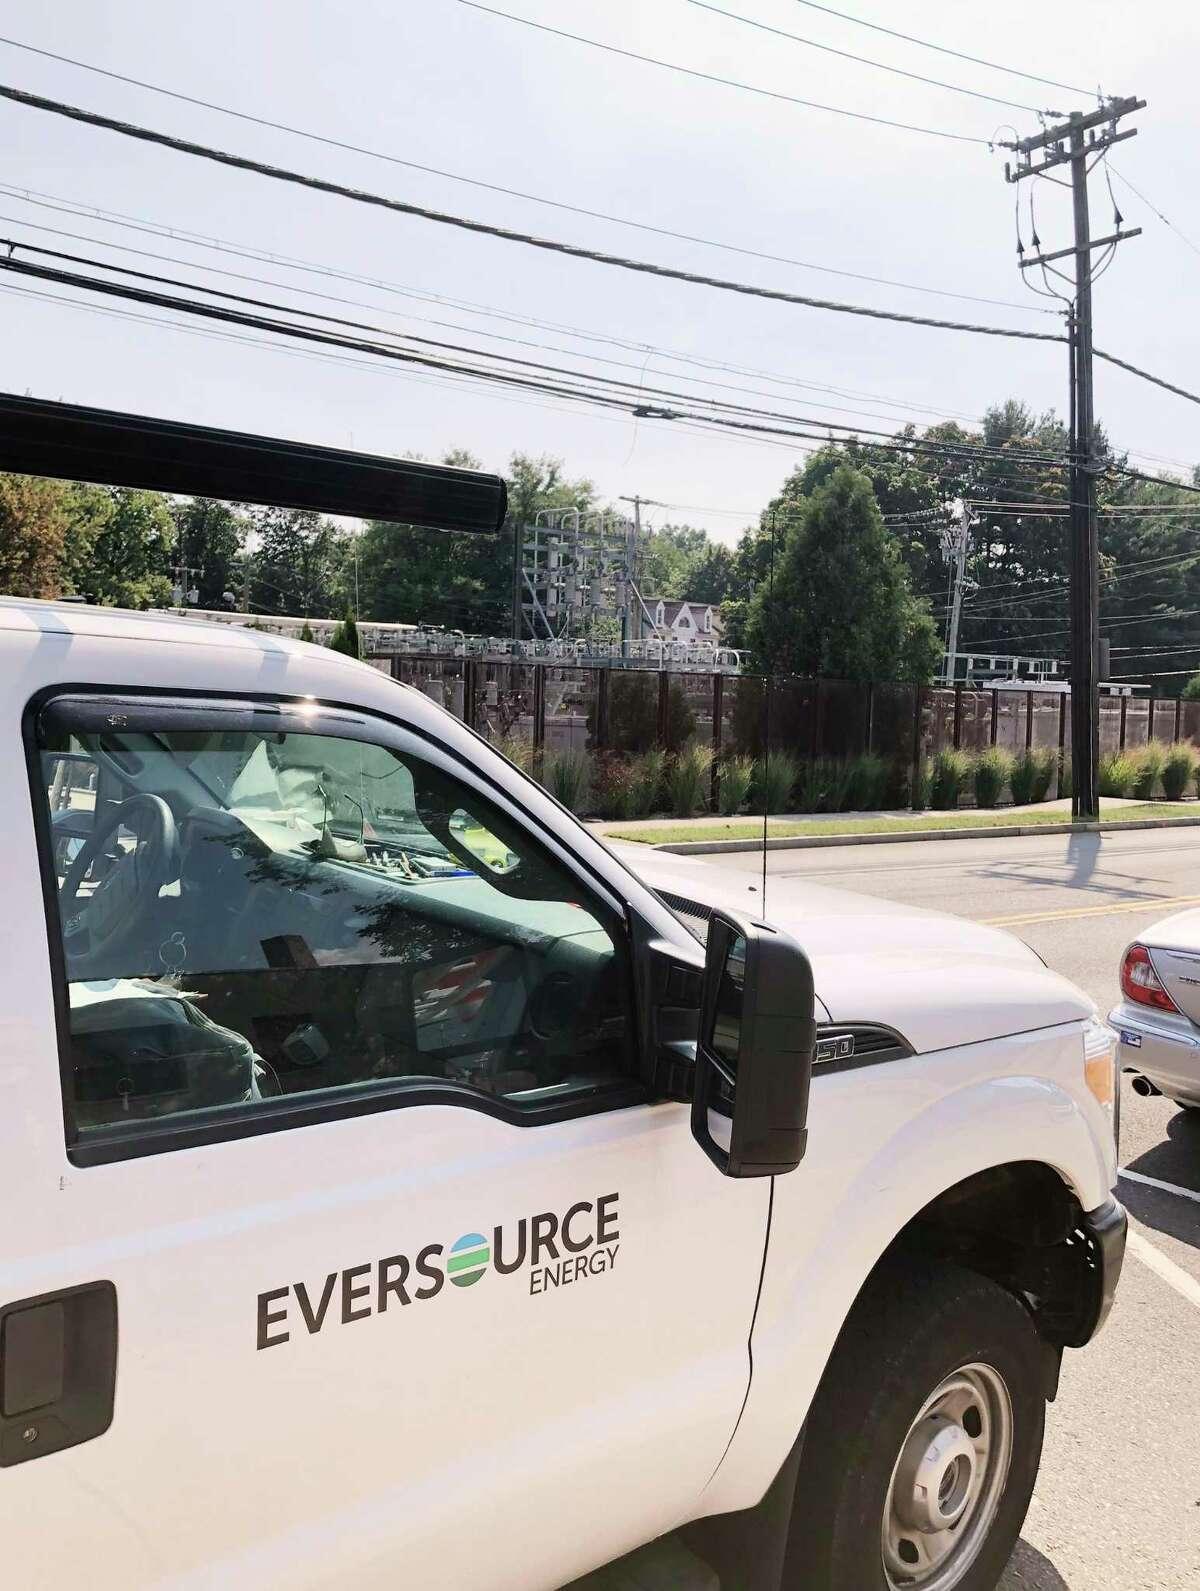 An Eversource Energy truck